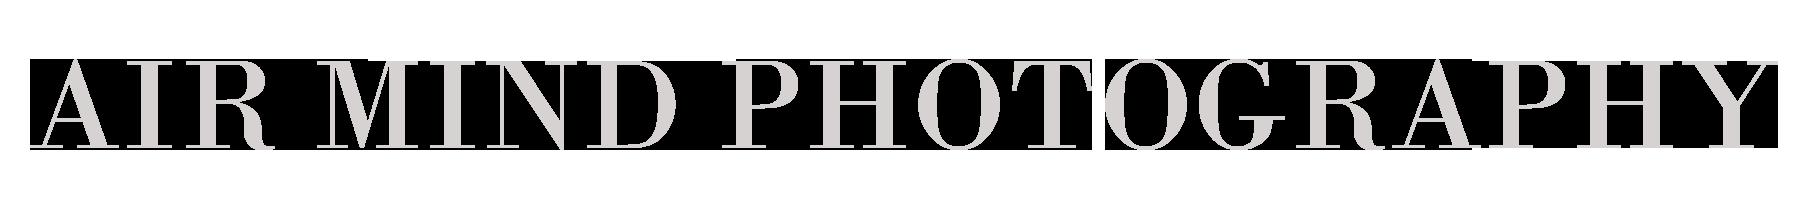 airmind photography-logo